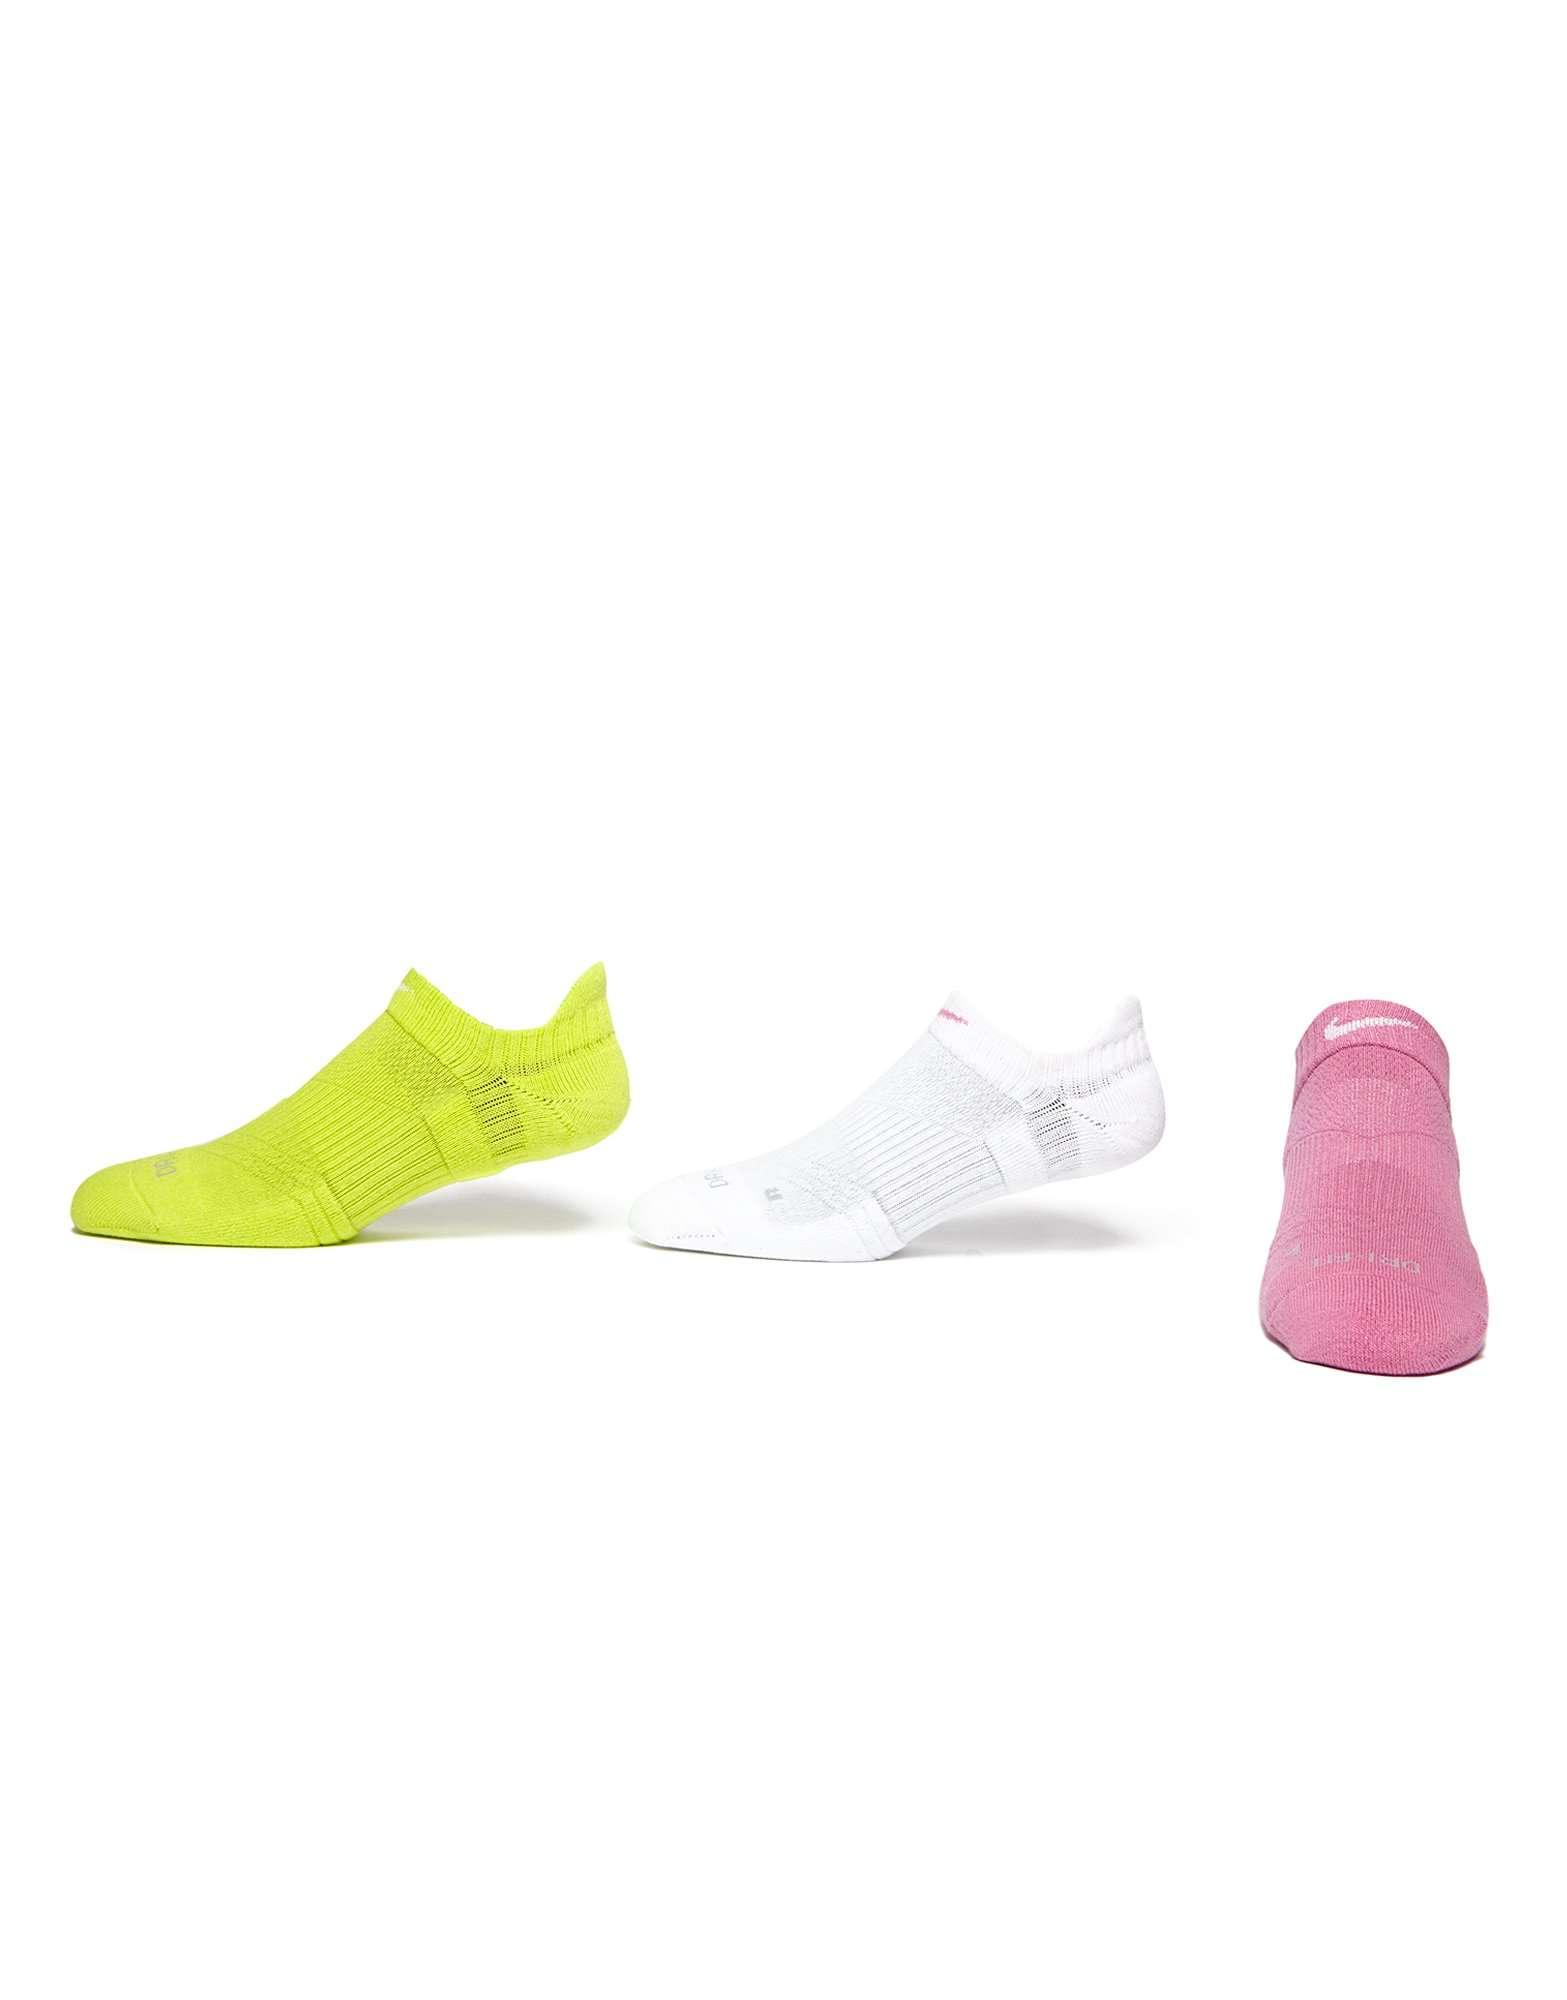 Nike 3 Pack Low Ped Socks